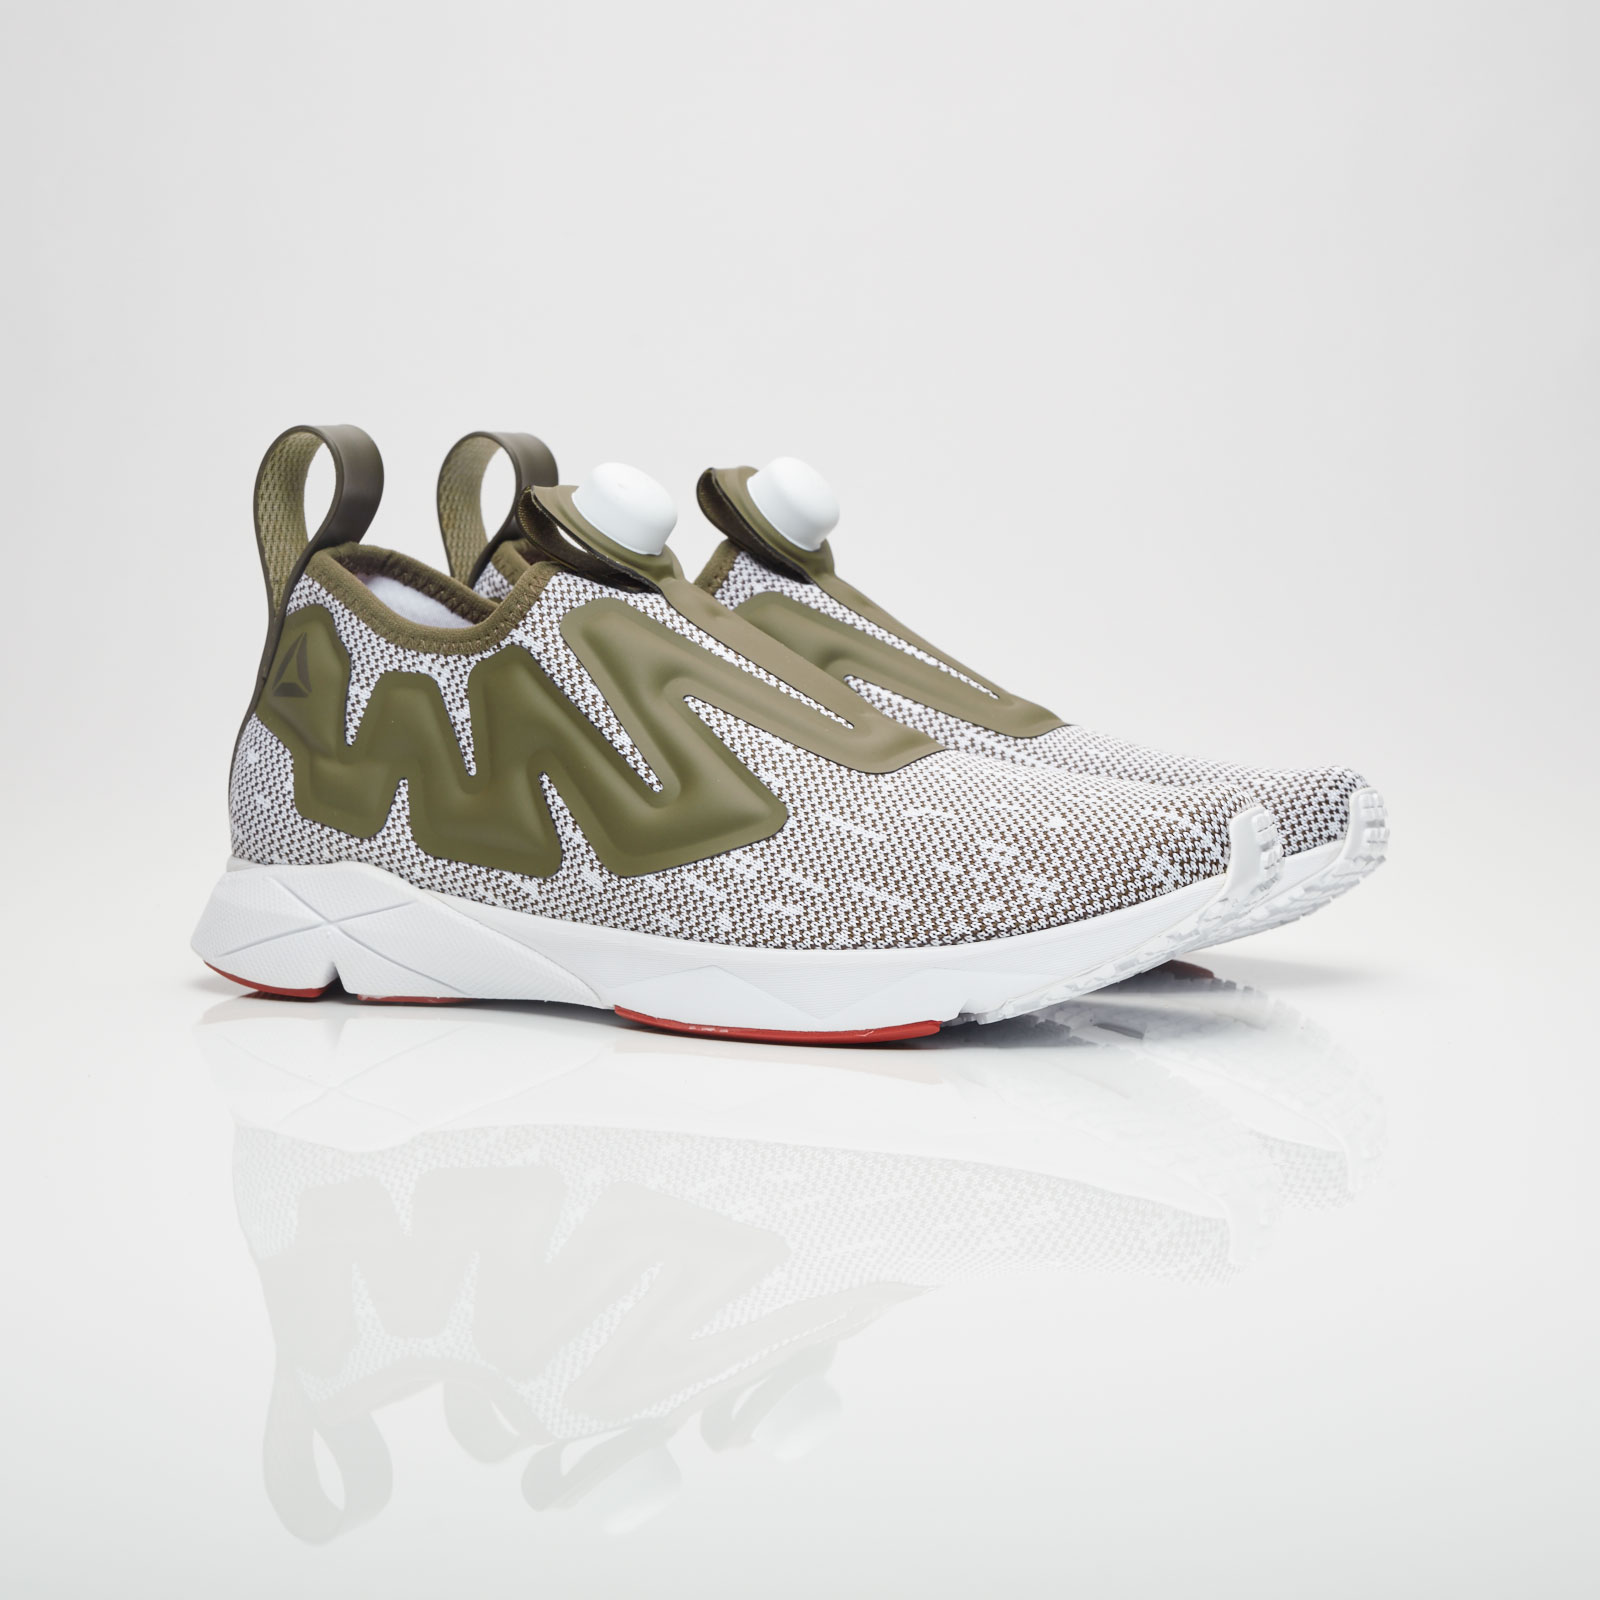 Reebok Pump Supreme - Cn1689 - Sneakersnstuff  6fb6bafec9